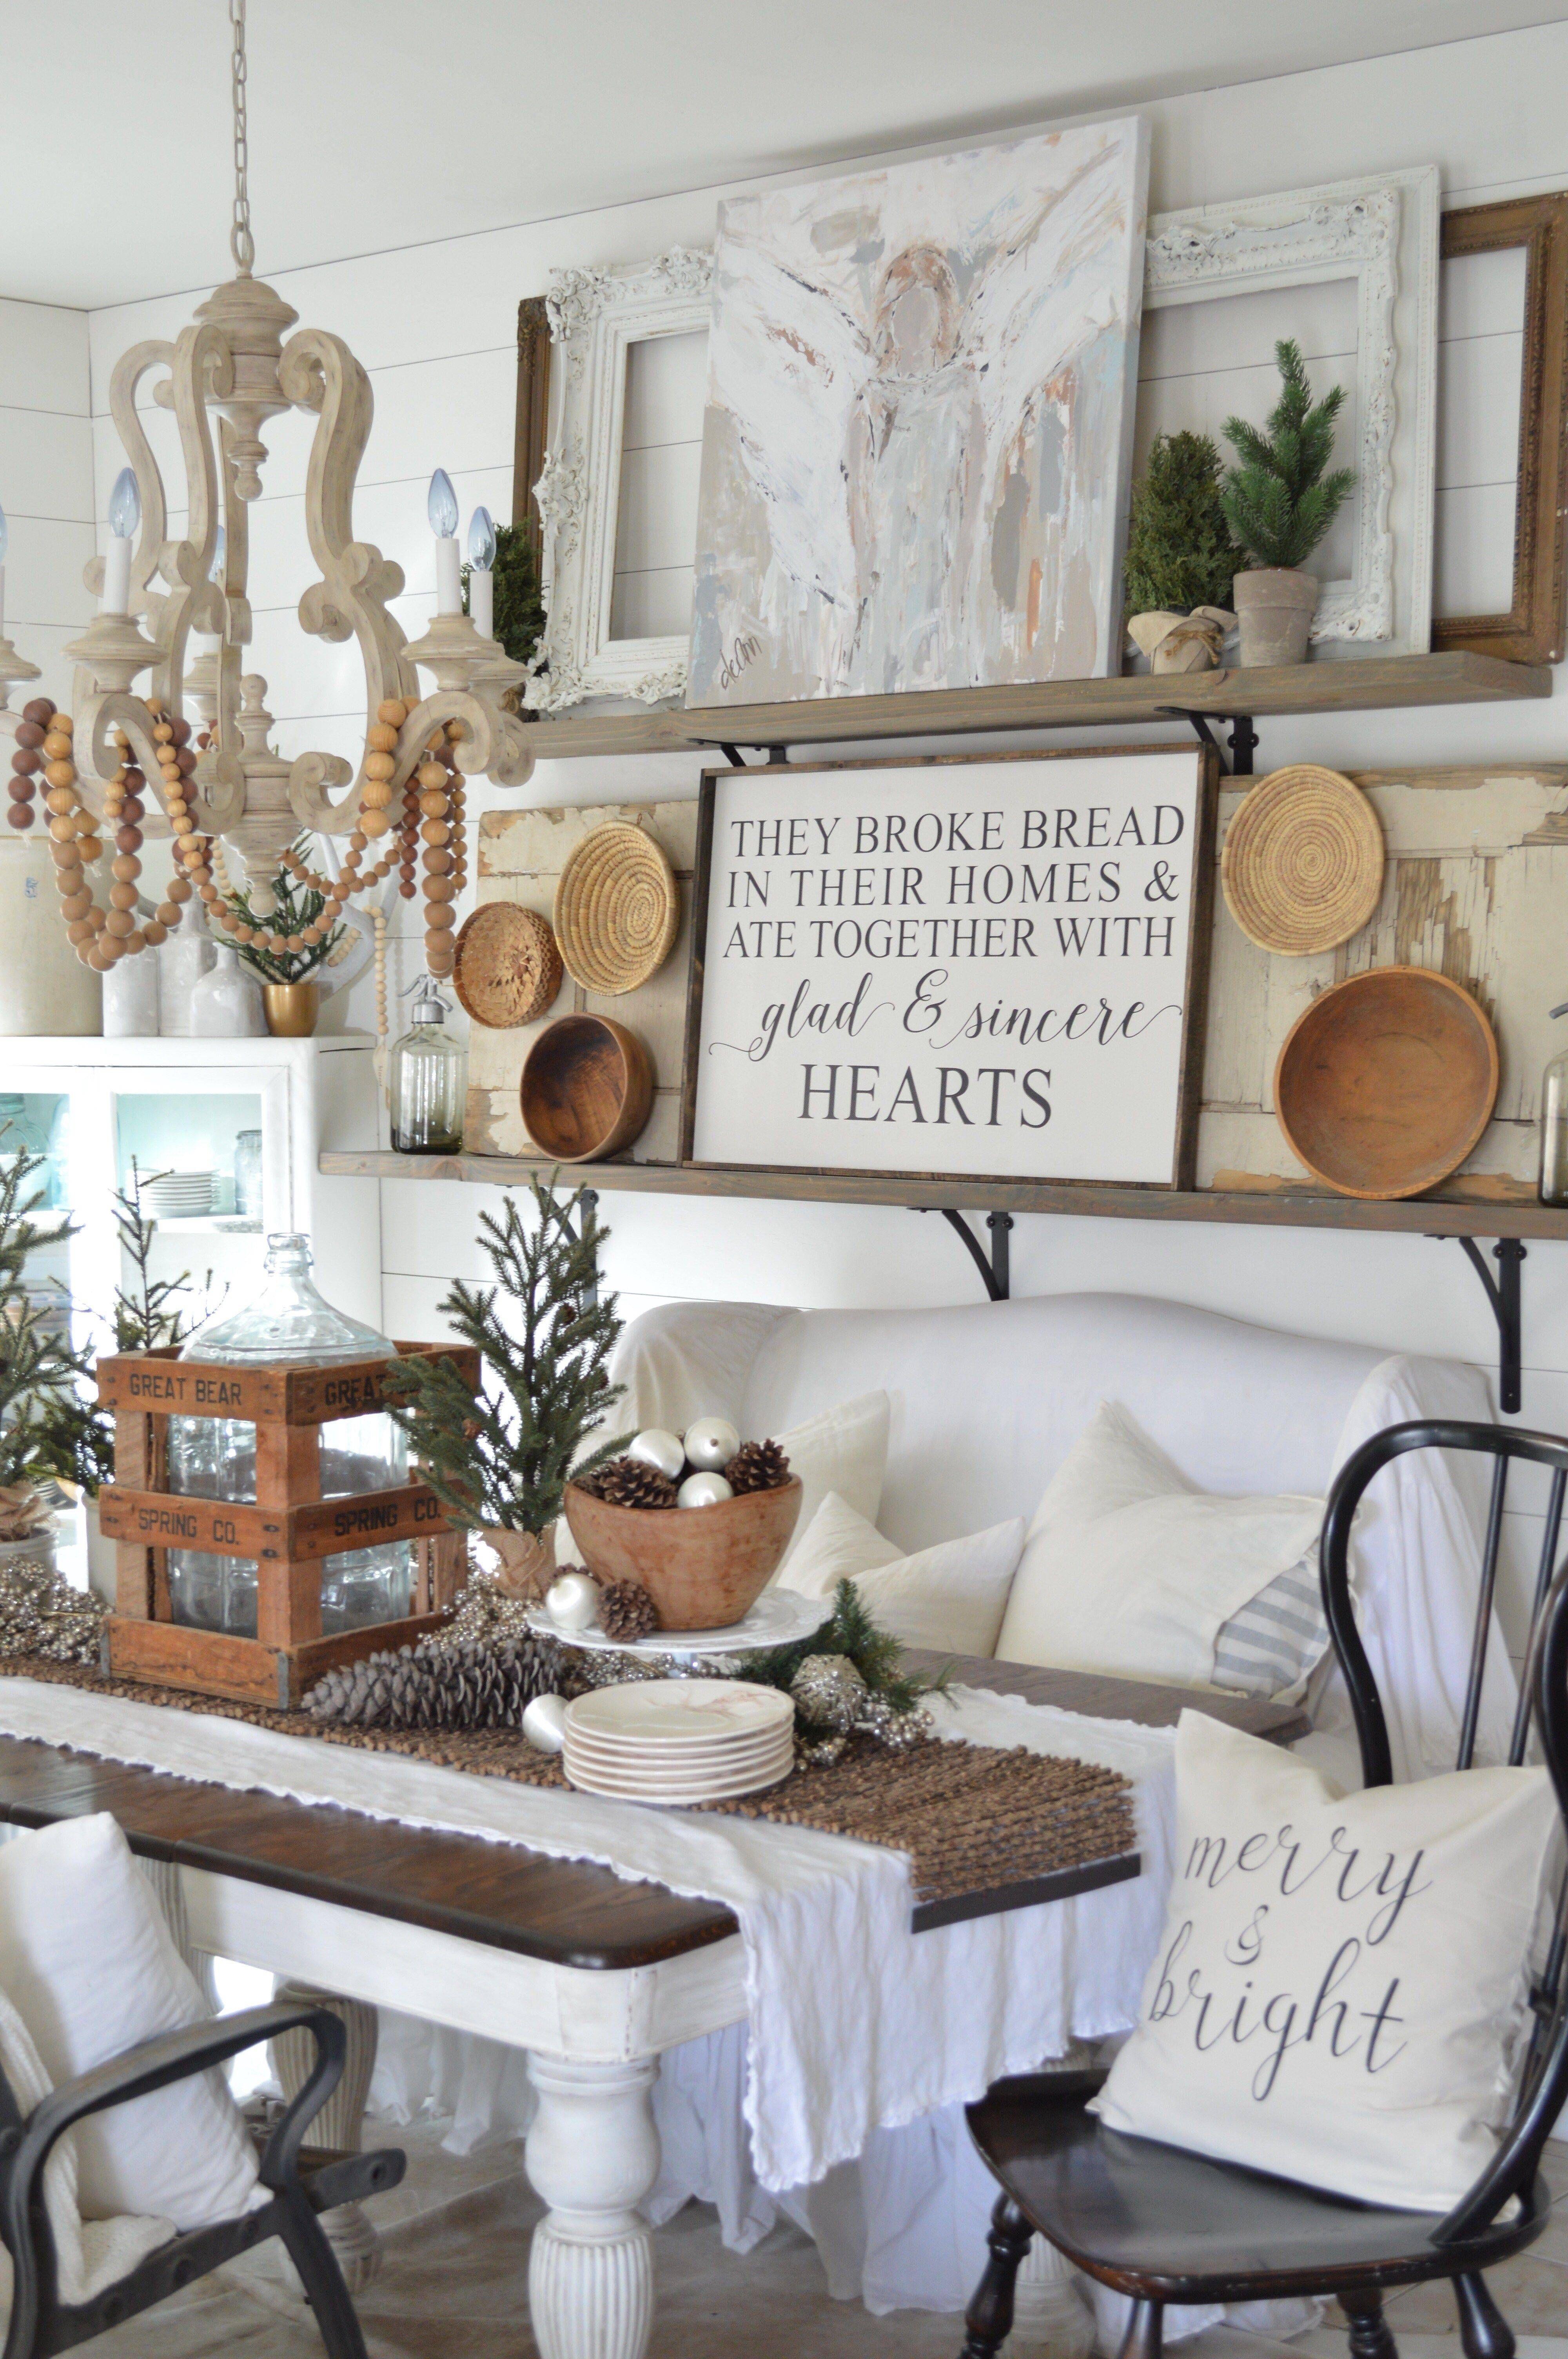 Antique Style Home Decor More Image Visite Home Decor Dining Room Design Decor